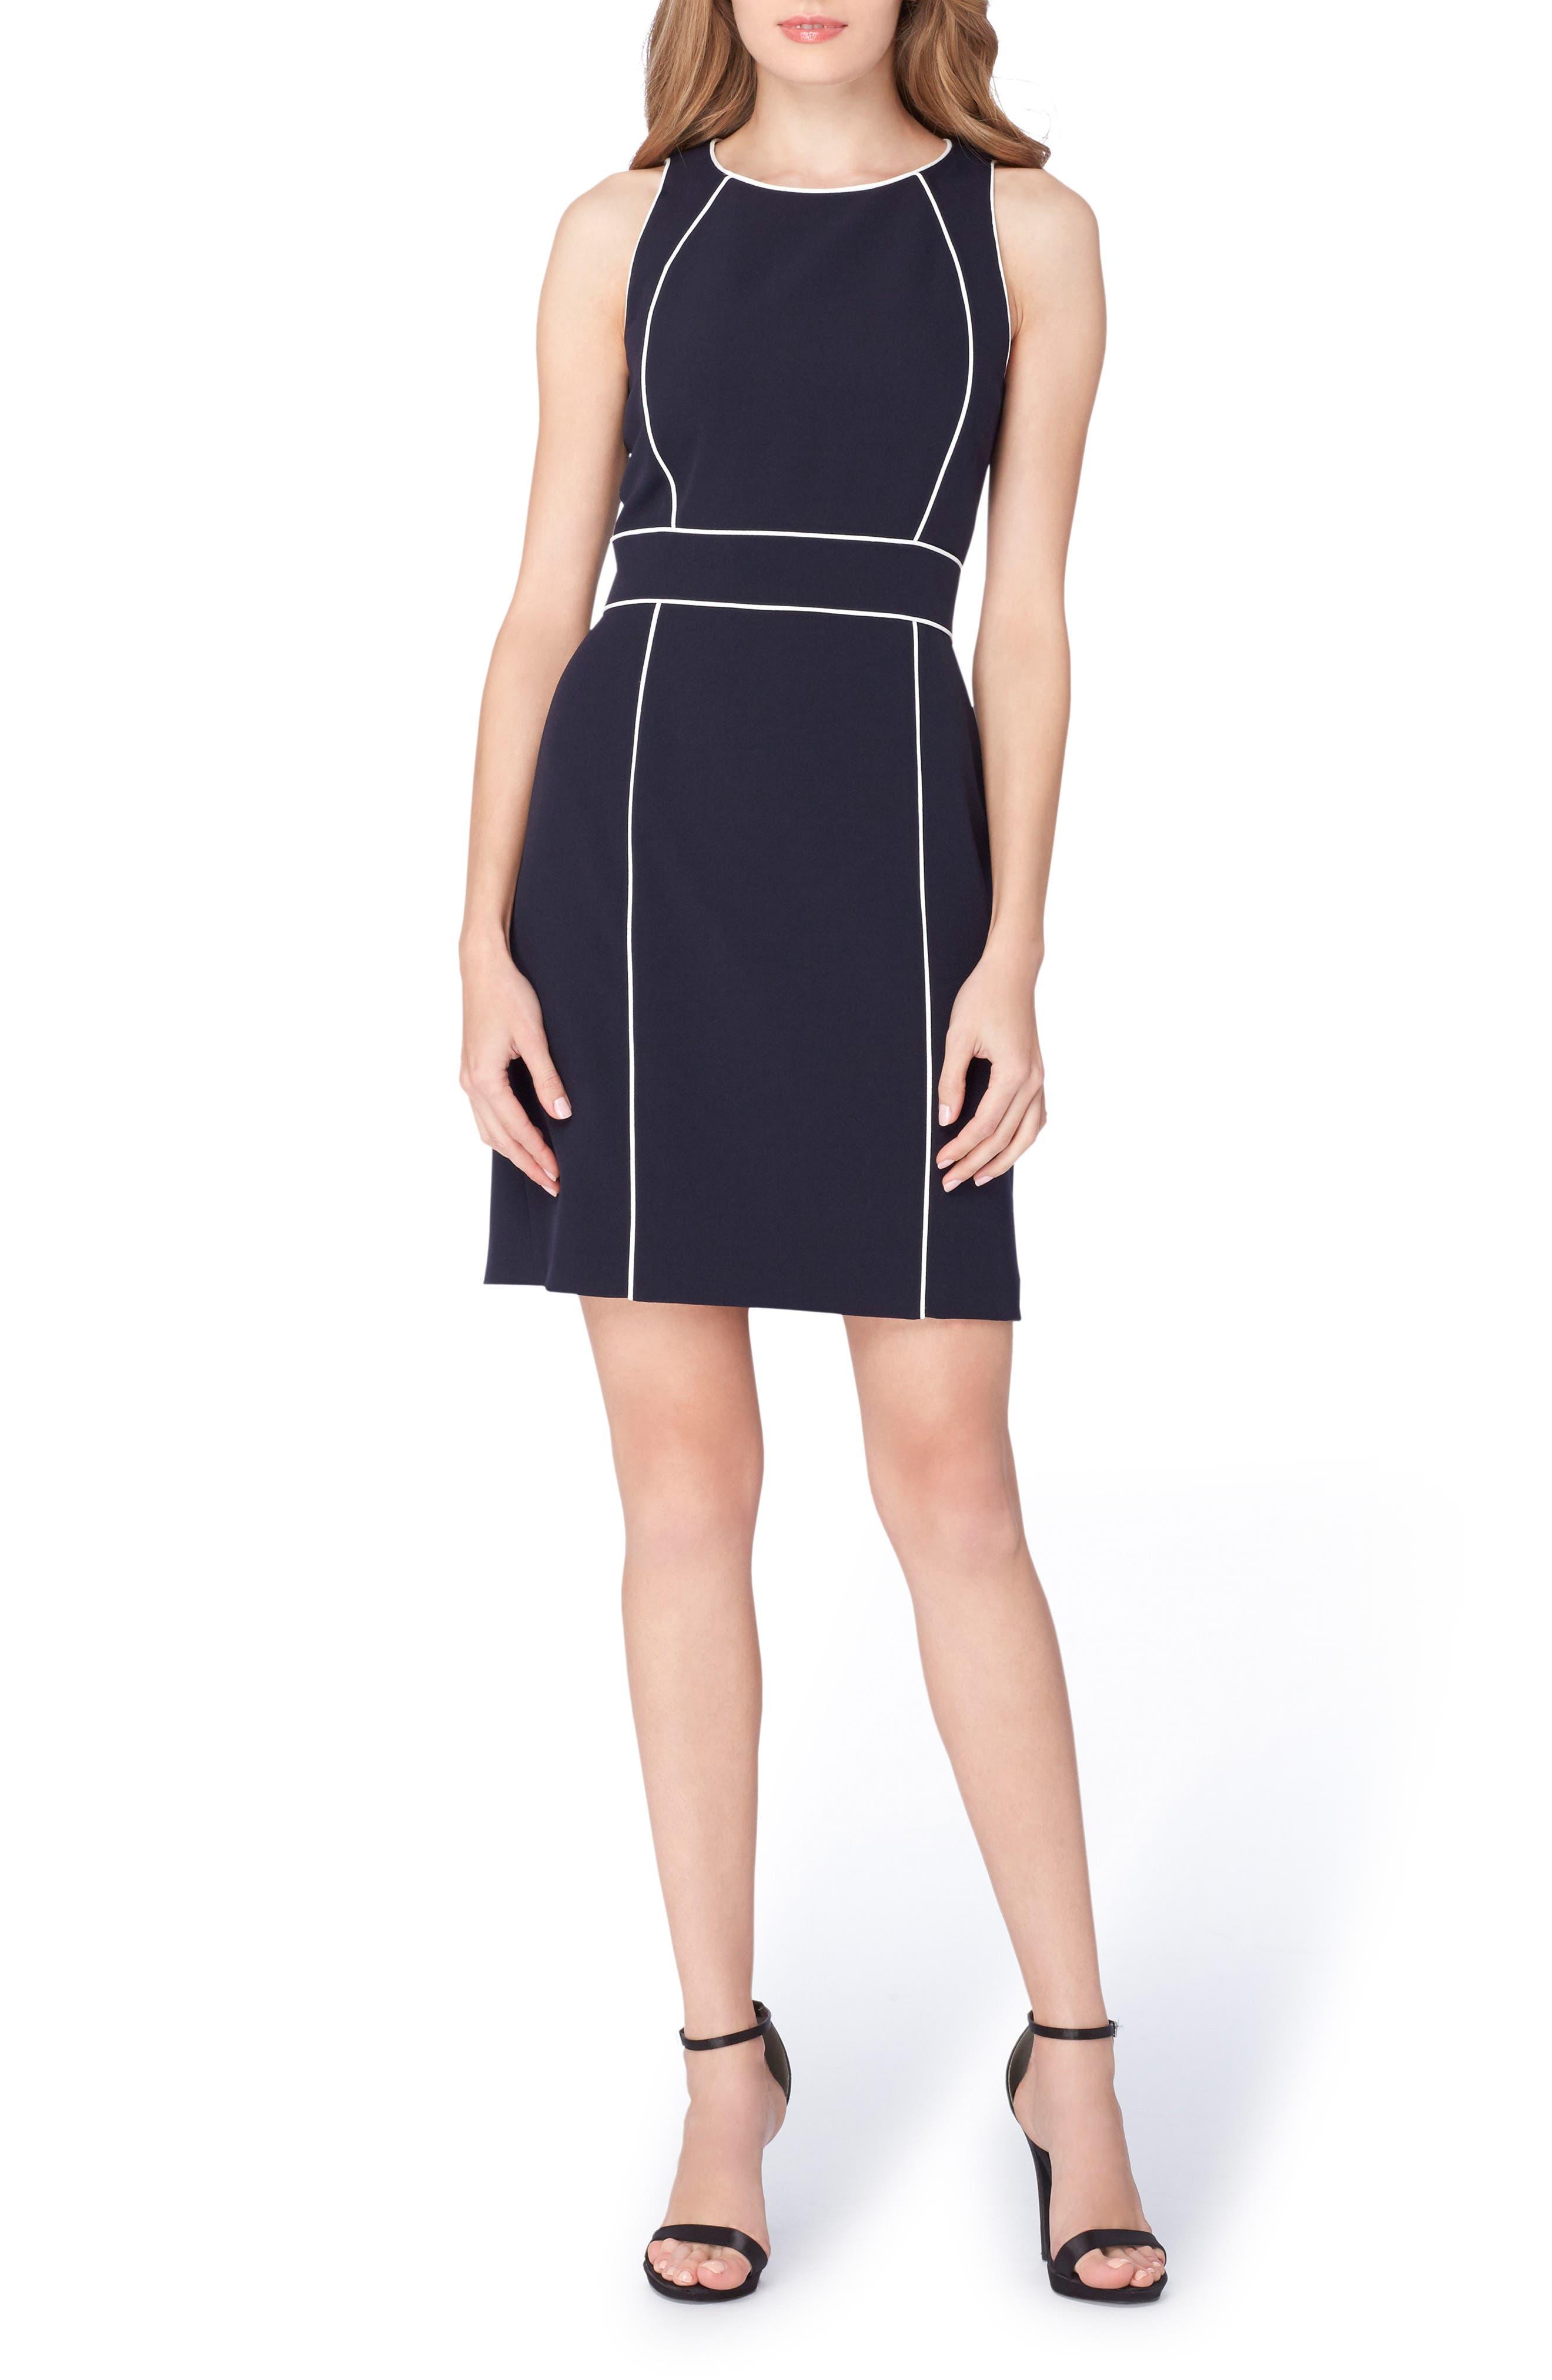 Alternate Image 1 Selected - Tahari Colorblock Sheath Dress (Regular & Petite)